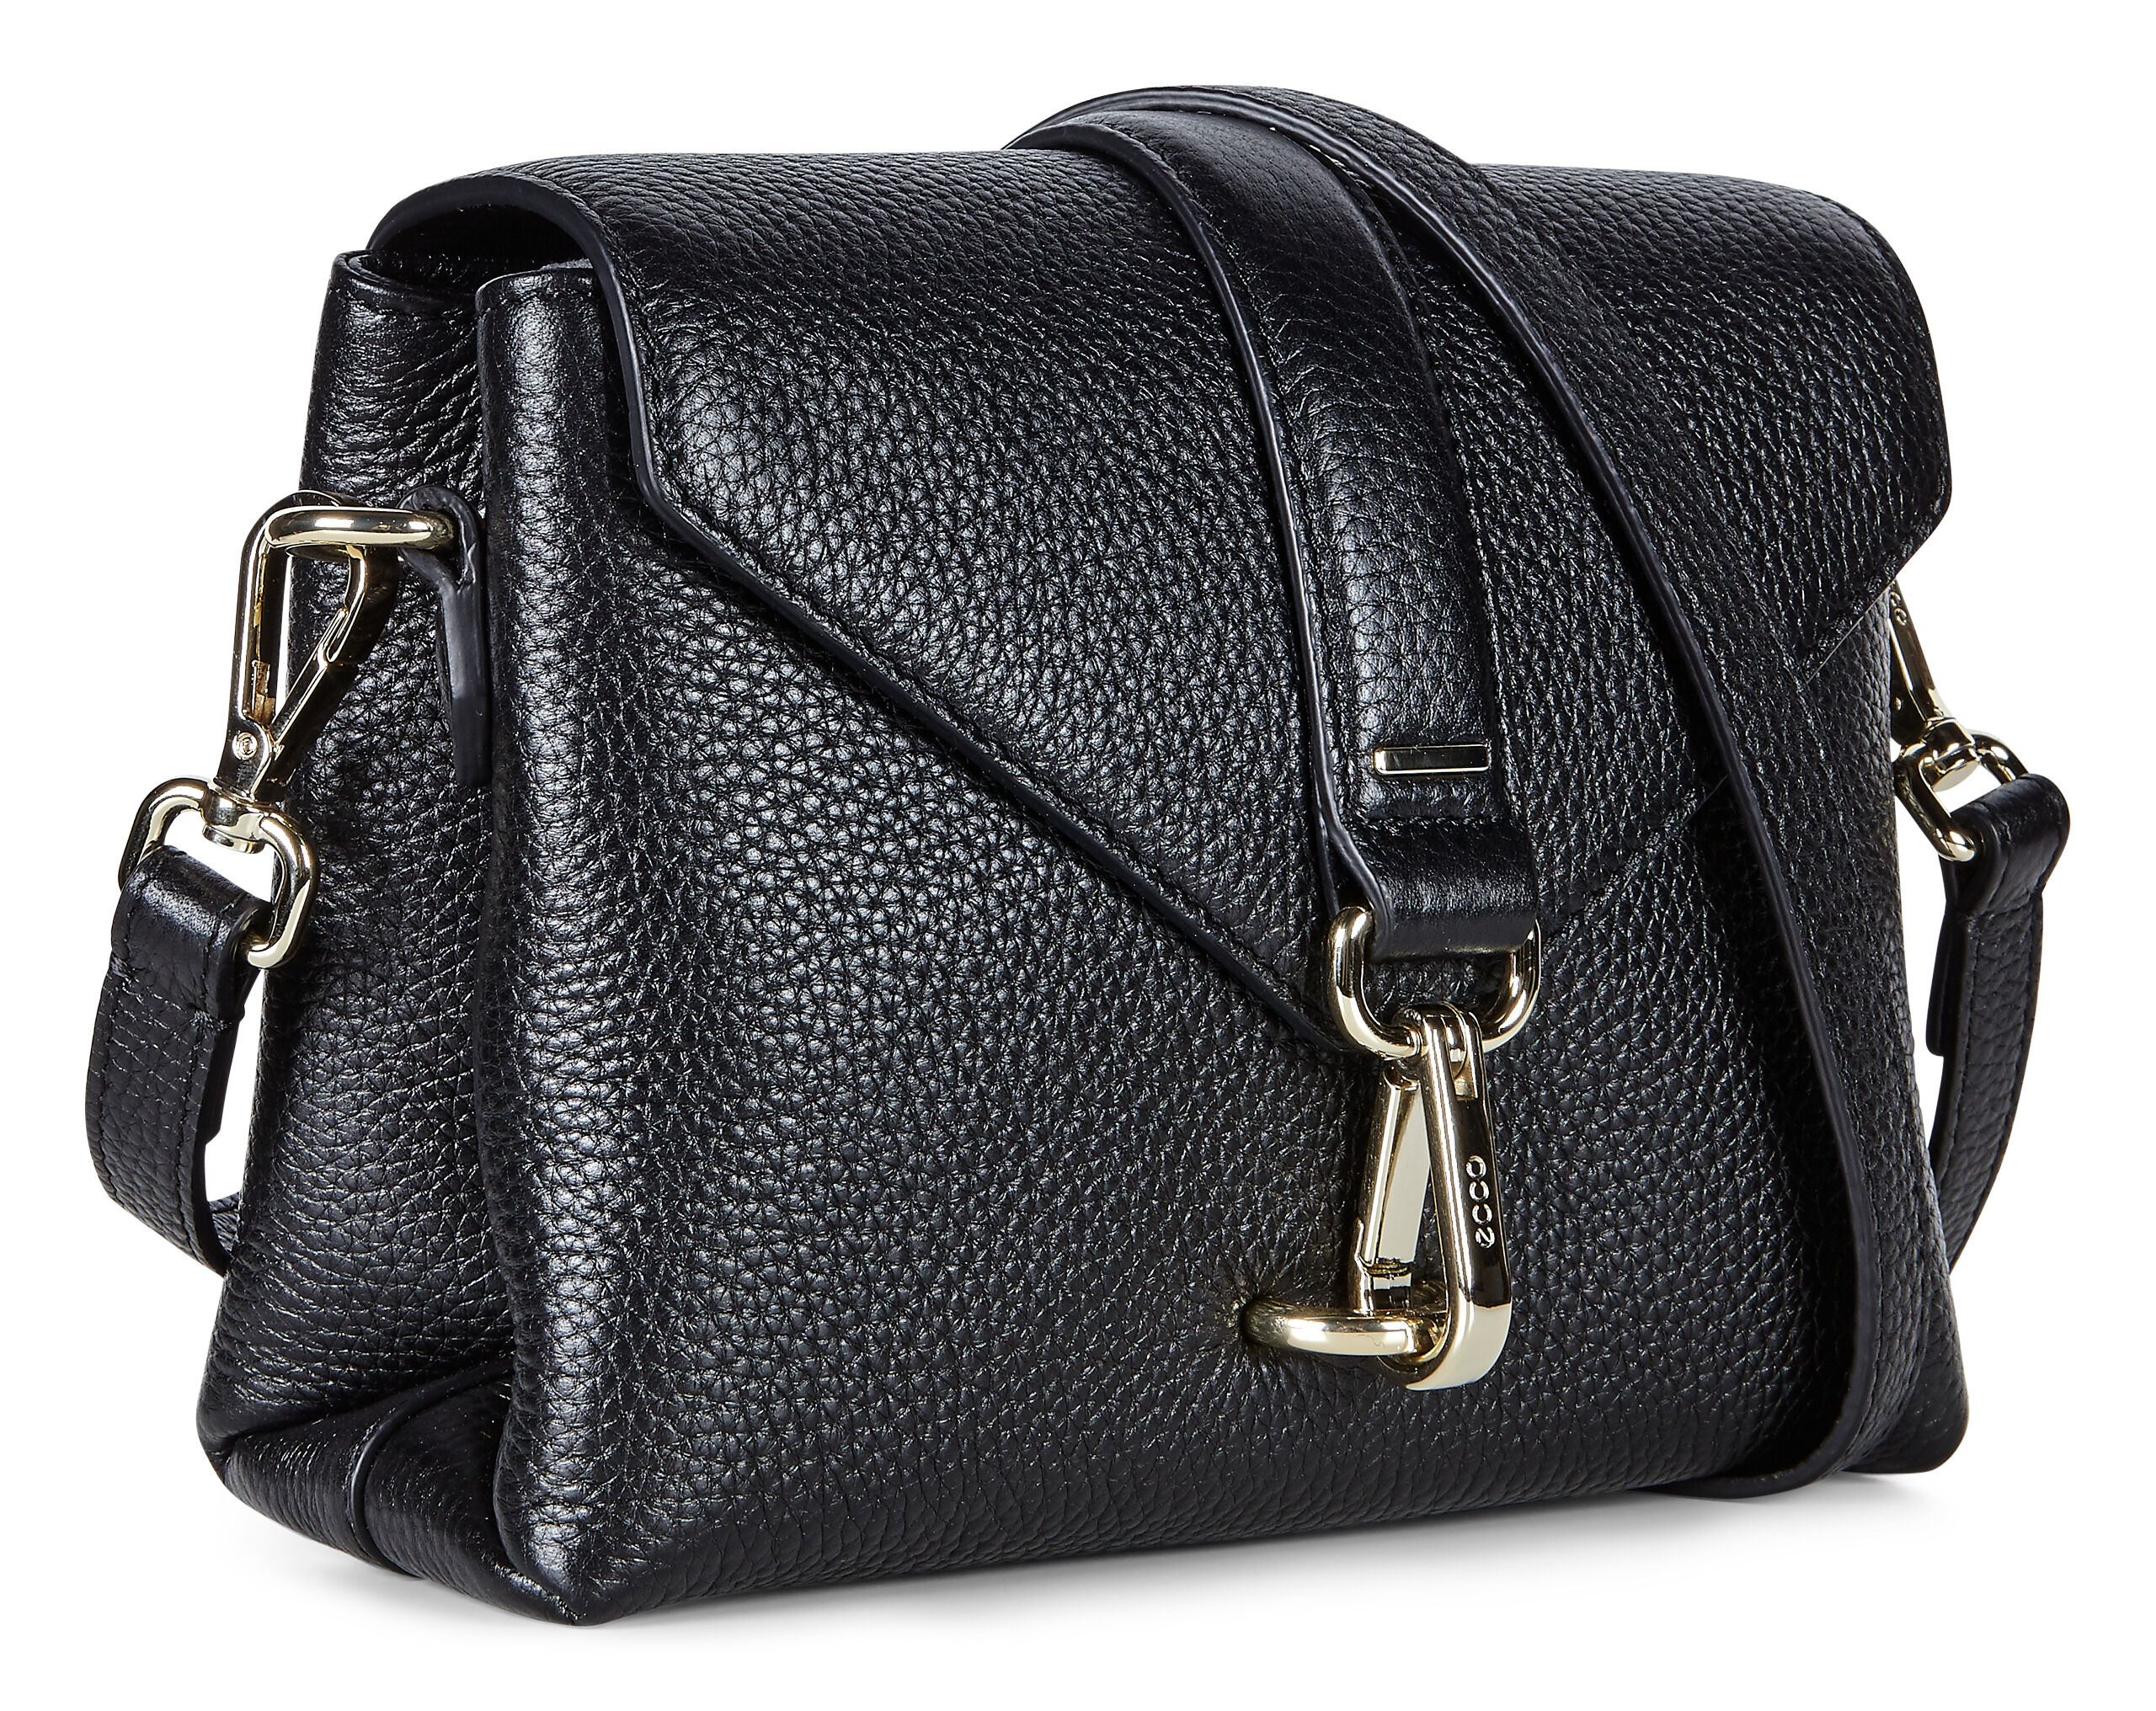 ad4b2f1507 ecco handbags